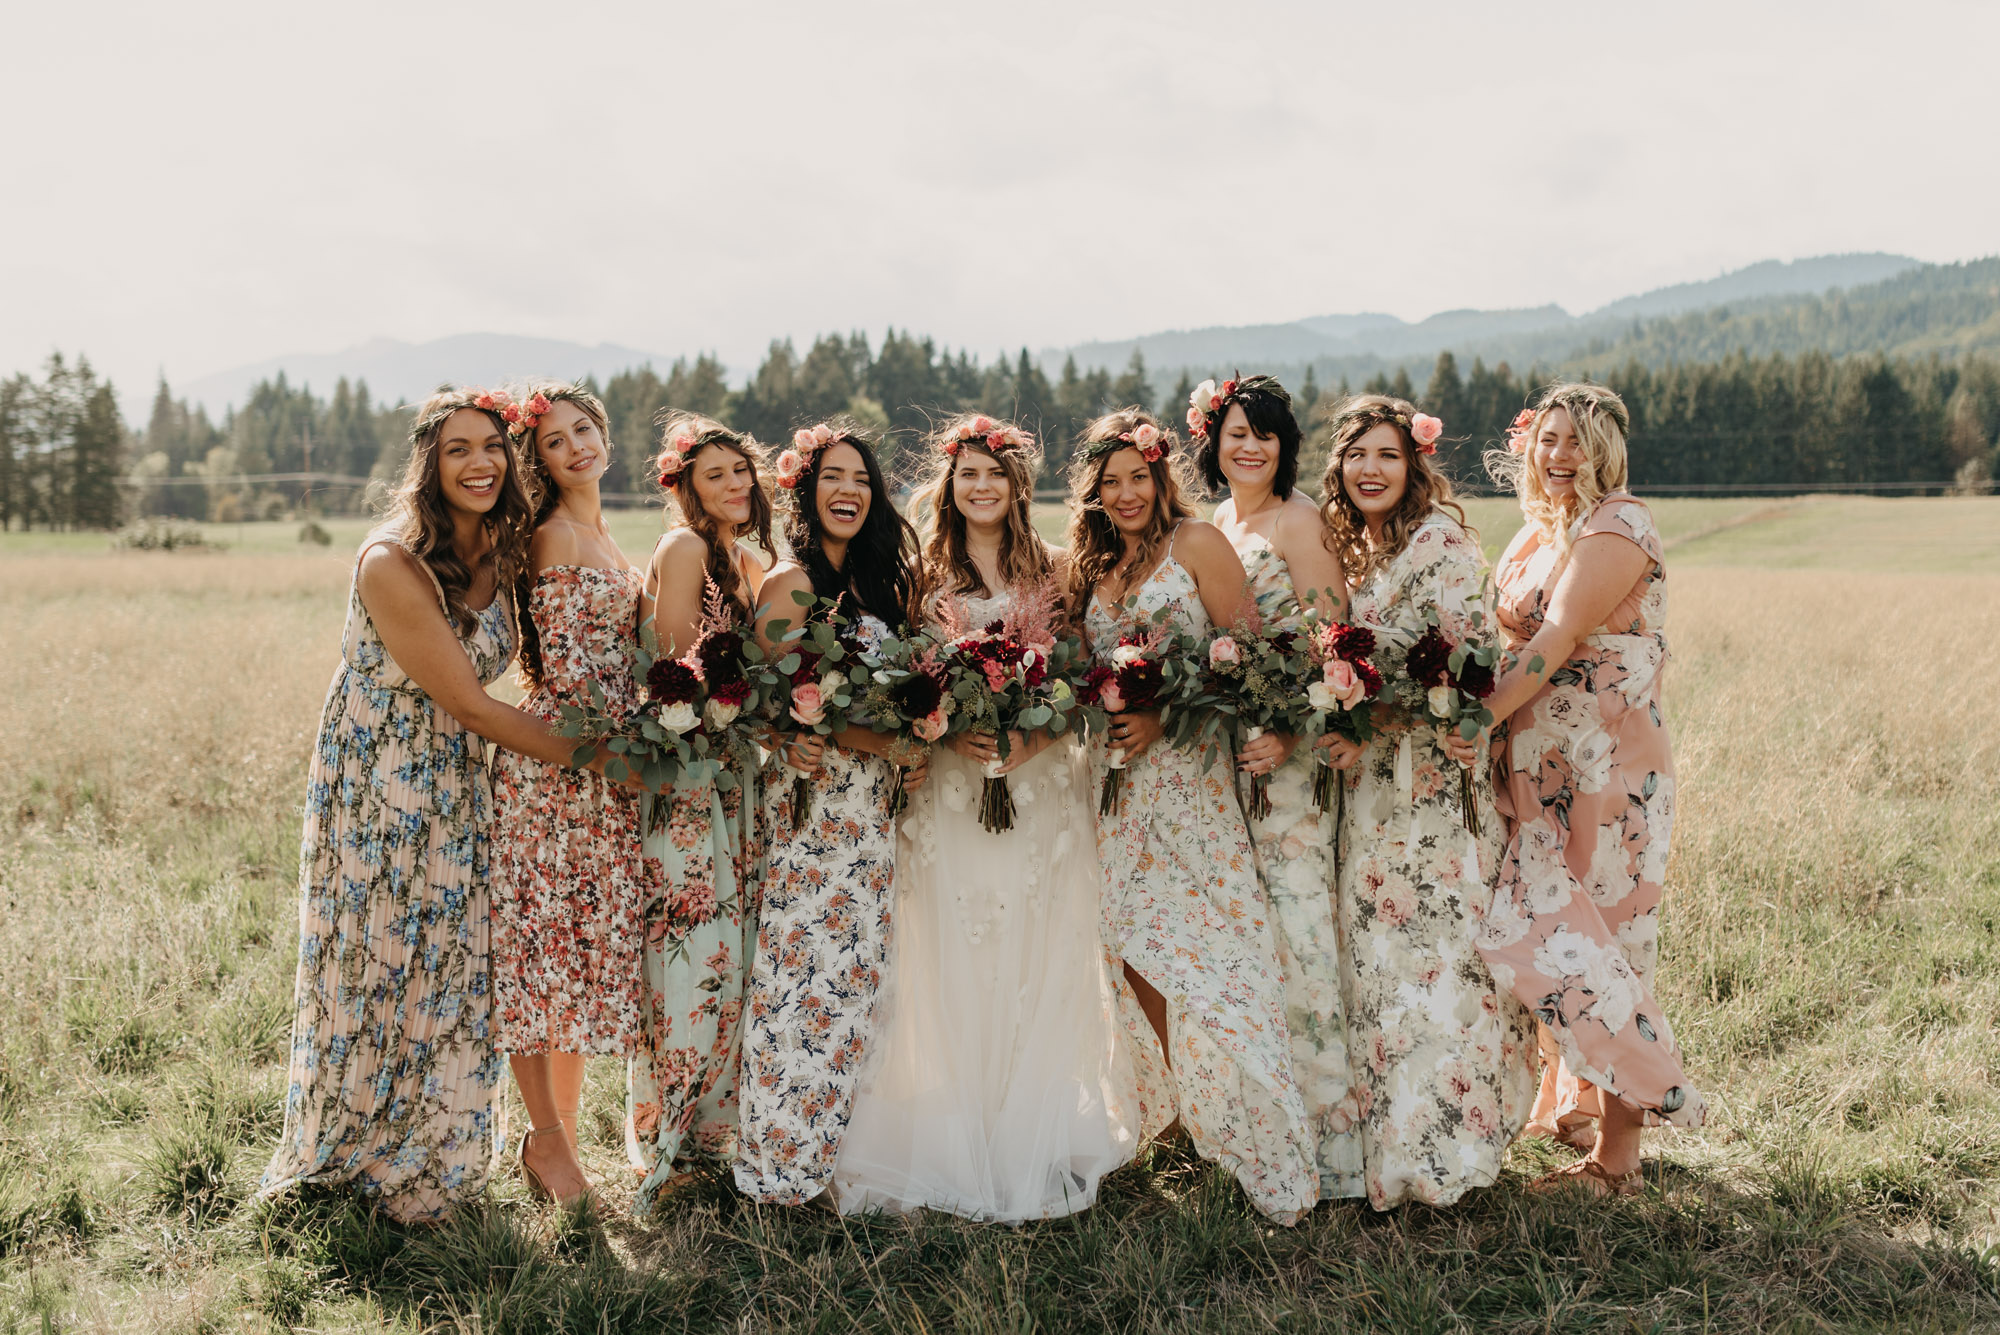 Bridal-Party-Free-People-Flower-Dresses-Washington-Wedding-8475.jpg